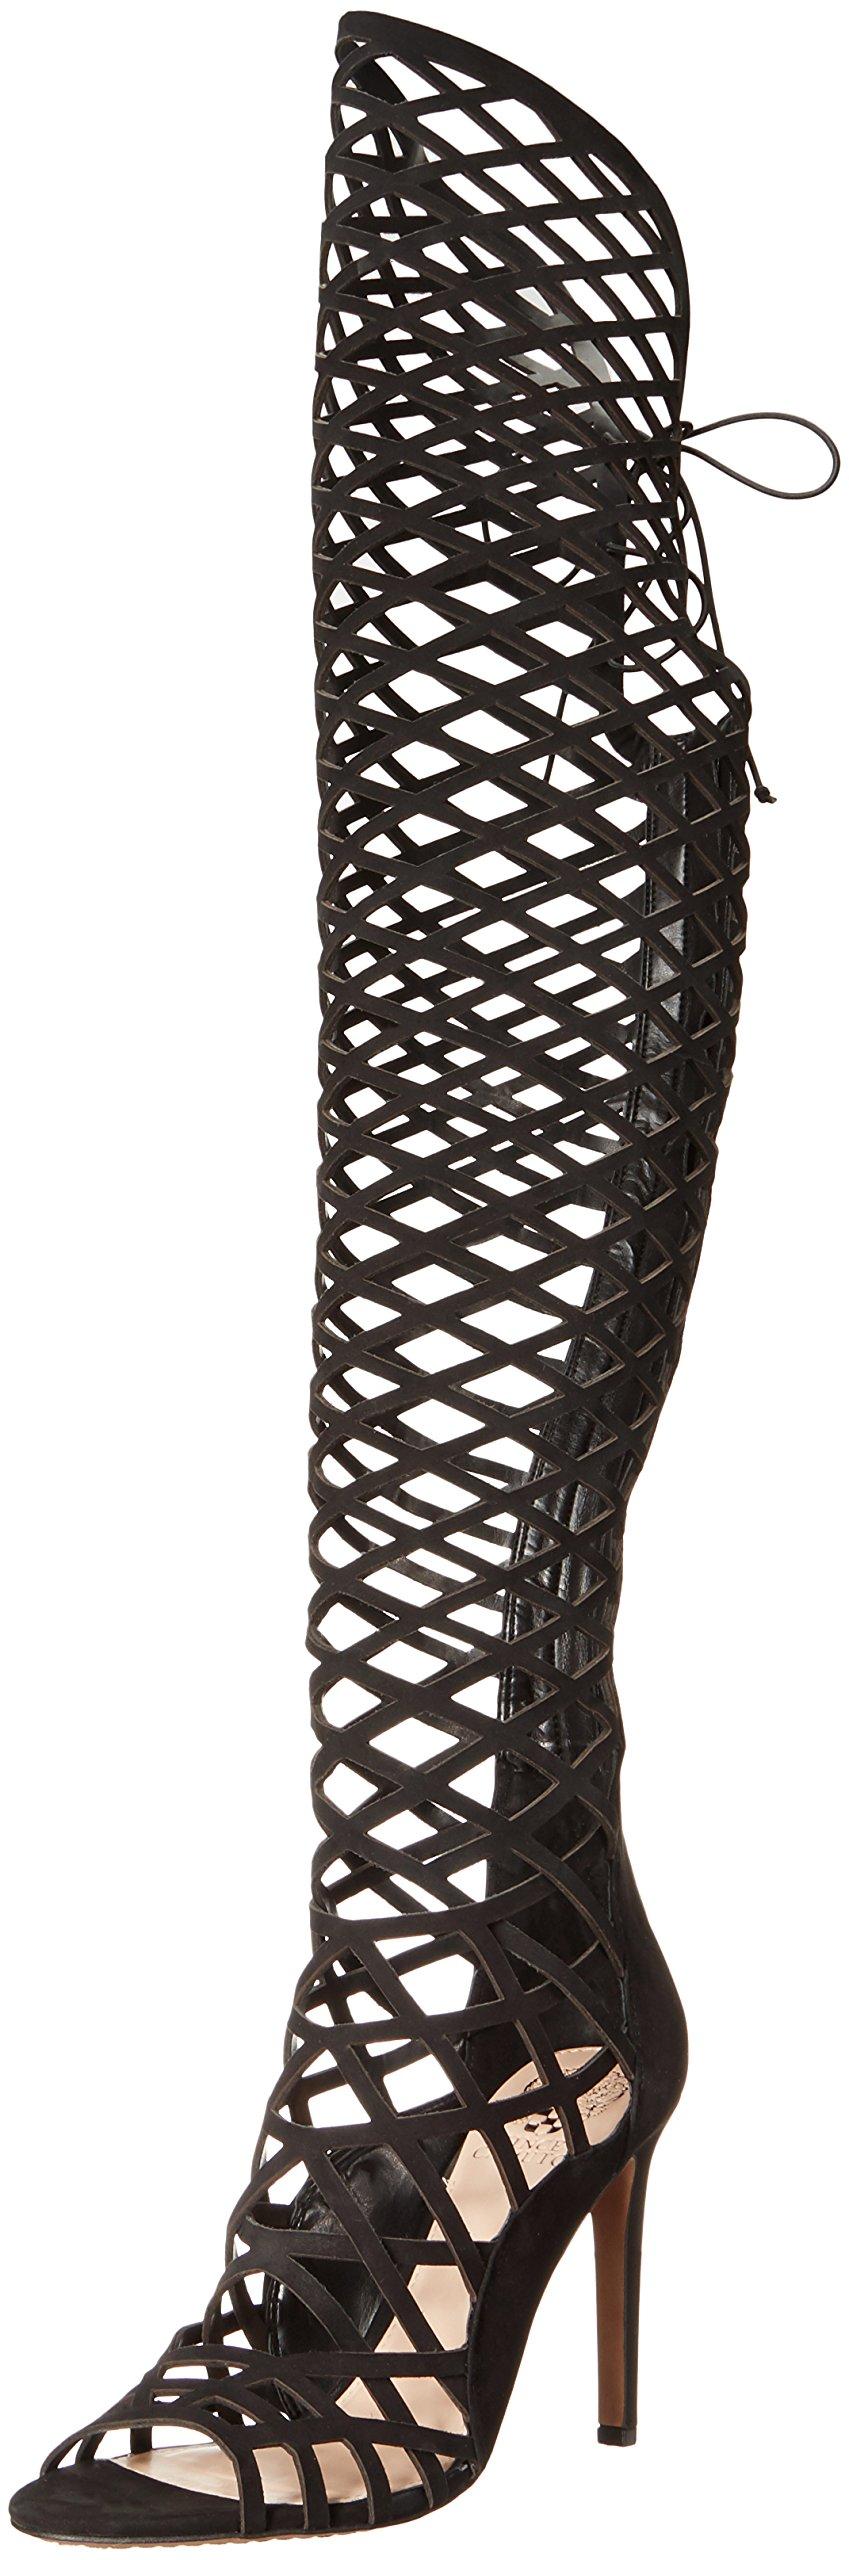 Vince Camuto Women's Keliana Gladiator Sandal, Black, 7.5 M US